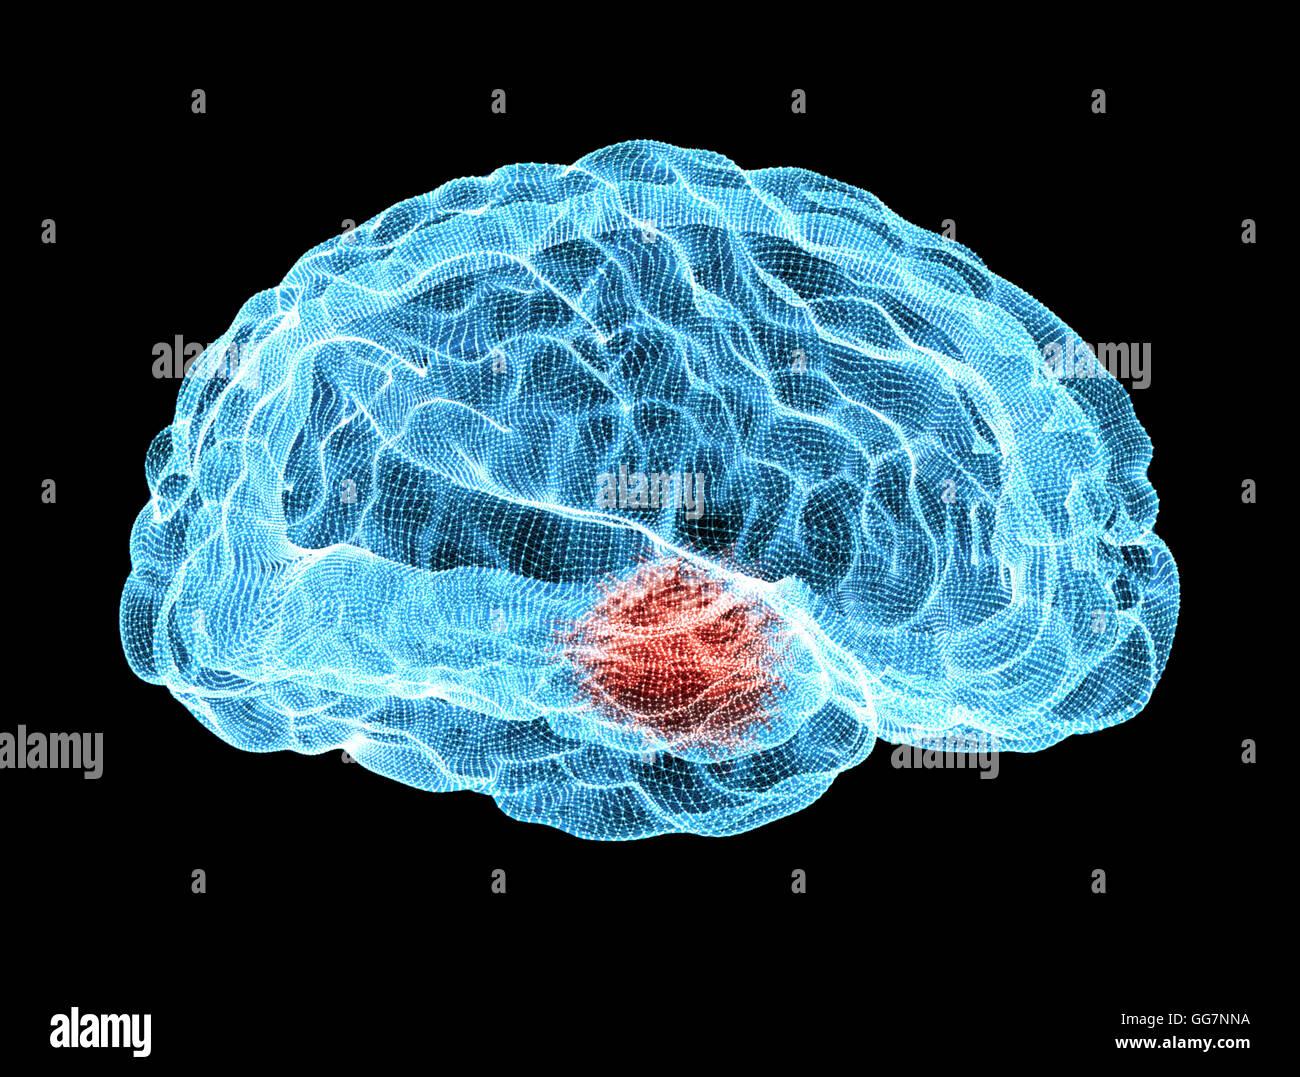 Brain degenerative diseases, Parkinson - Stock Image